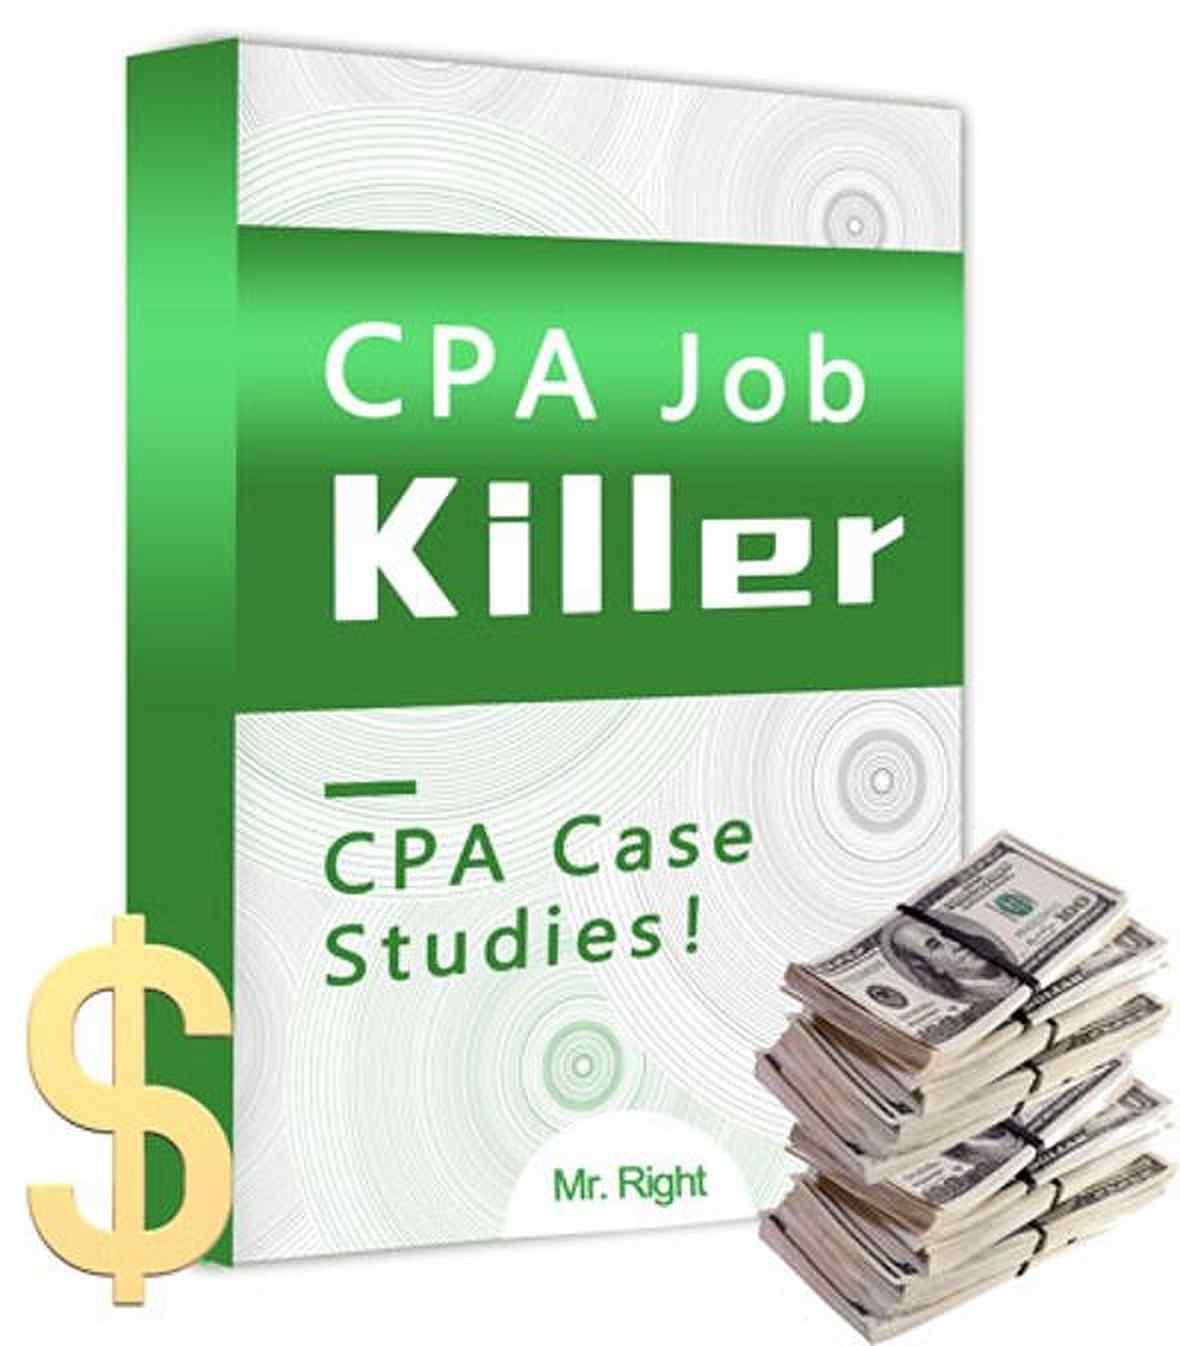 CPA Job Killer – Make $300-$1000 or More Per Day